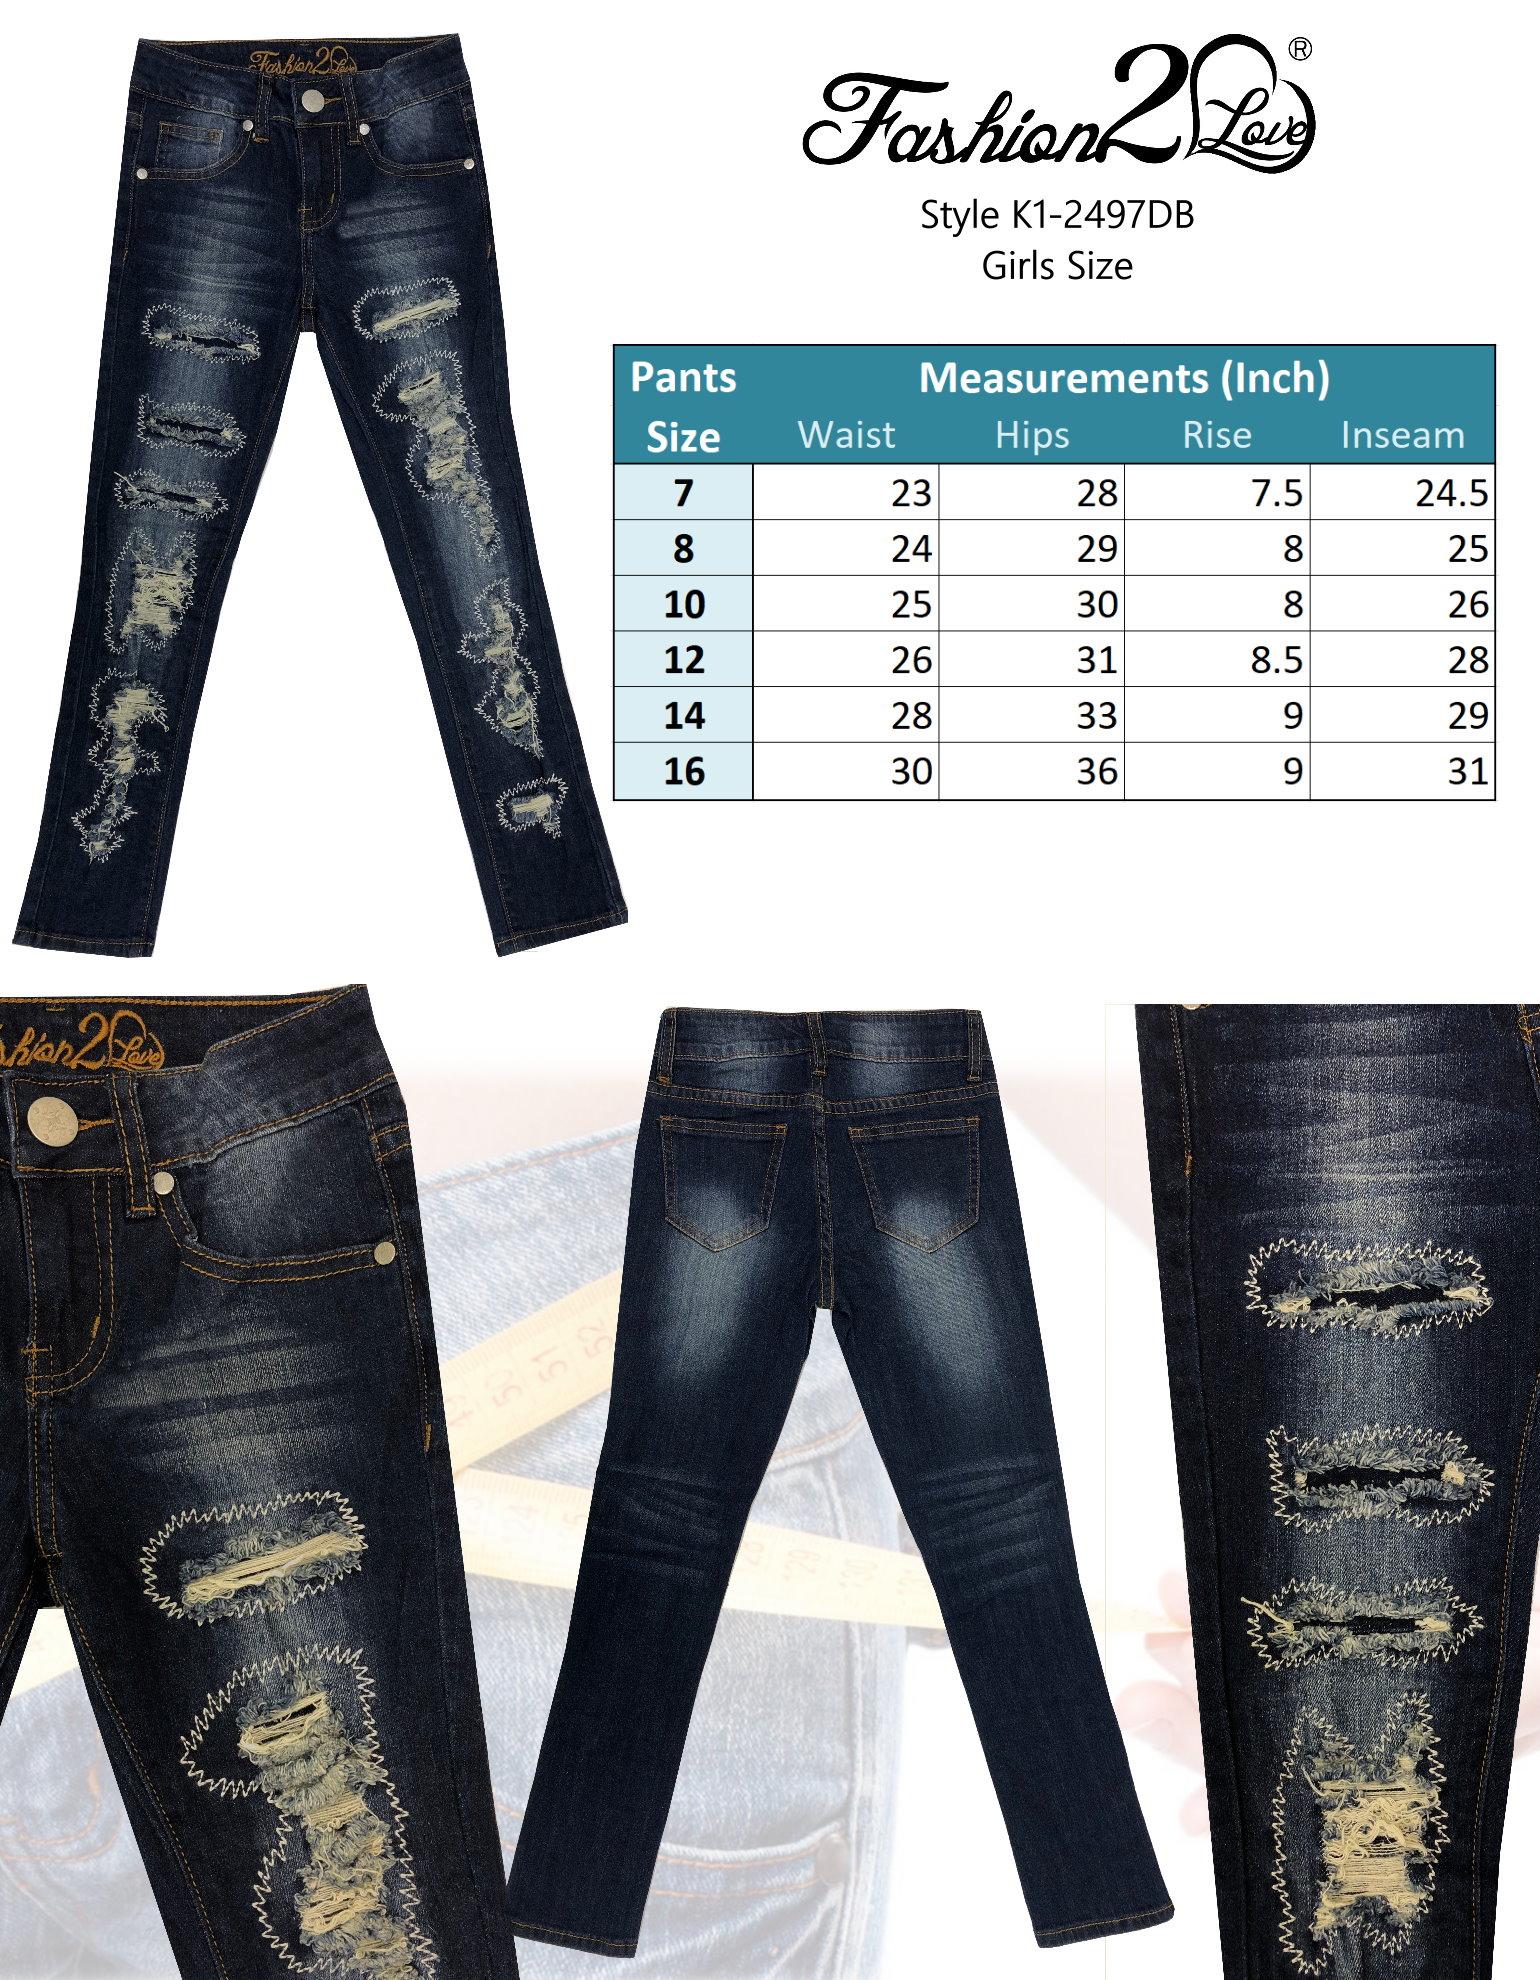 S 7H102 Girls' Stretch 5 Pockets Premium Skinny jeans